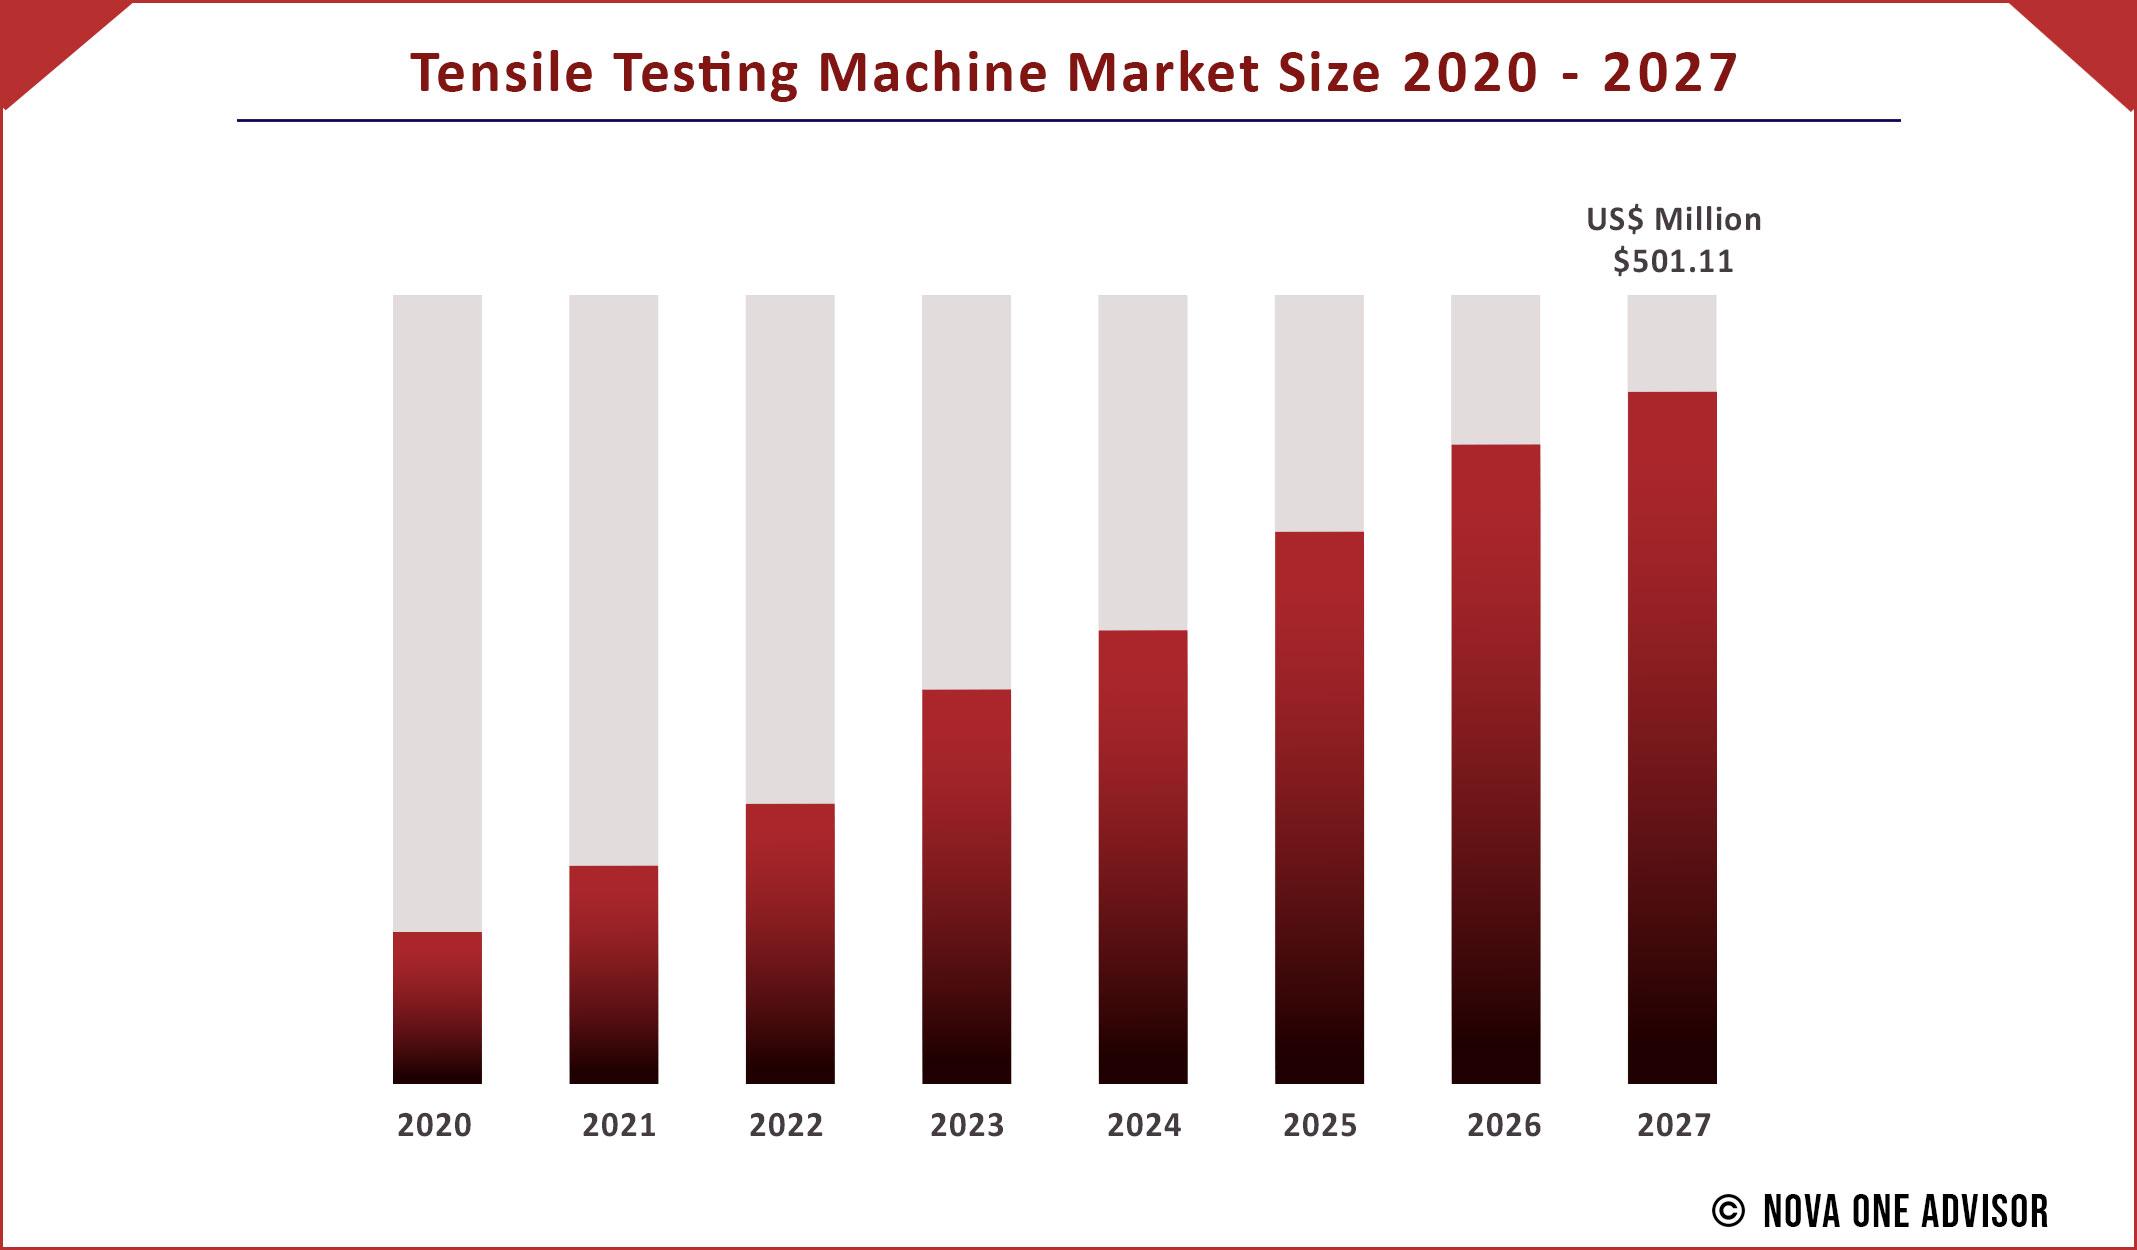 Tensile Testing Machine Market Size 2020 to 2027